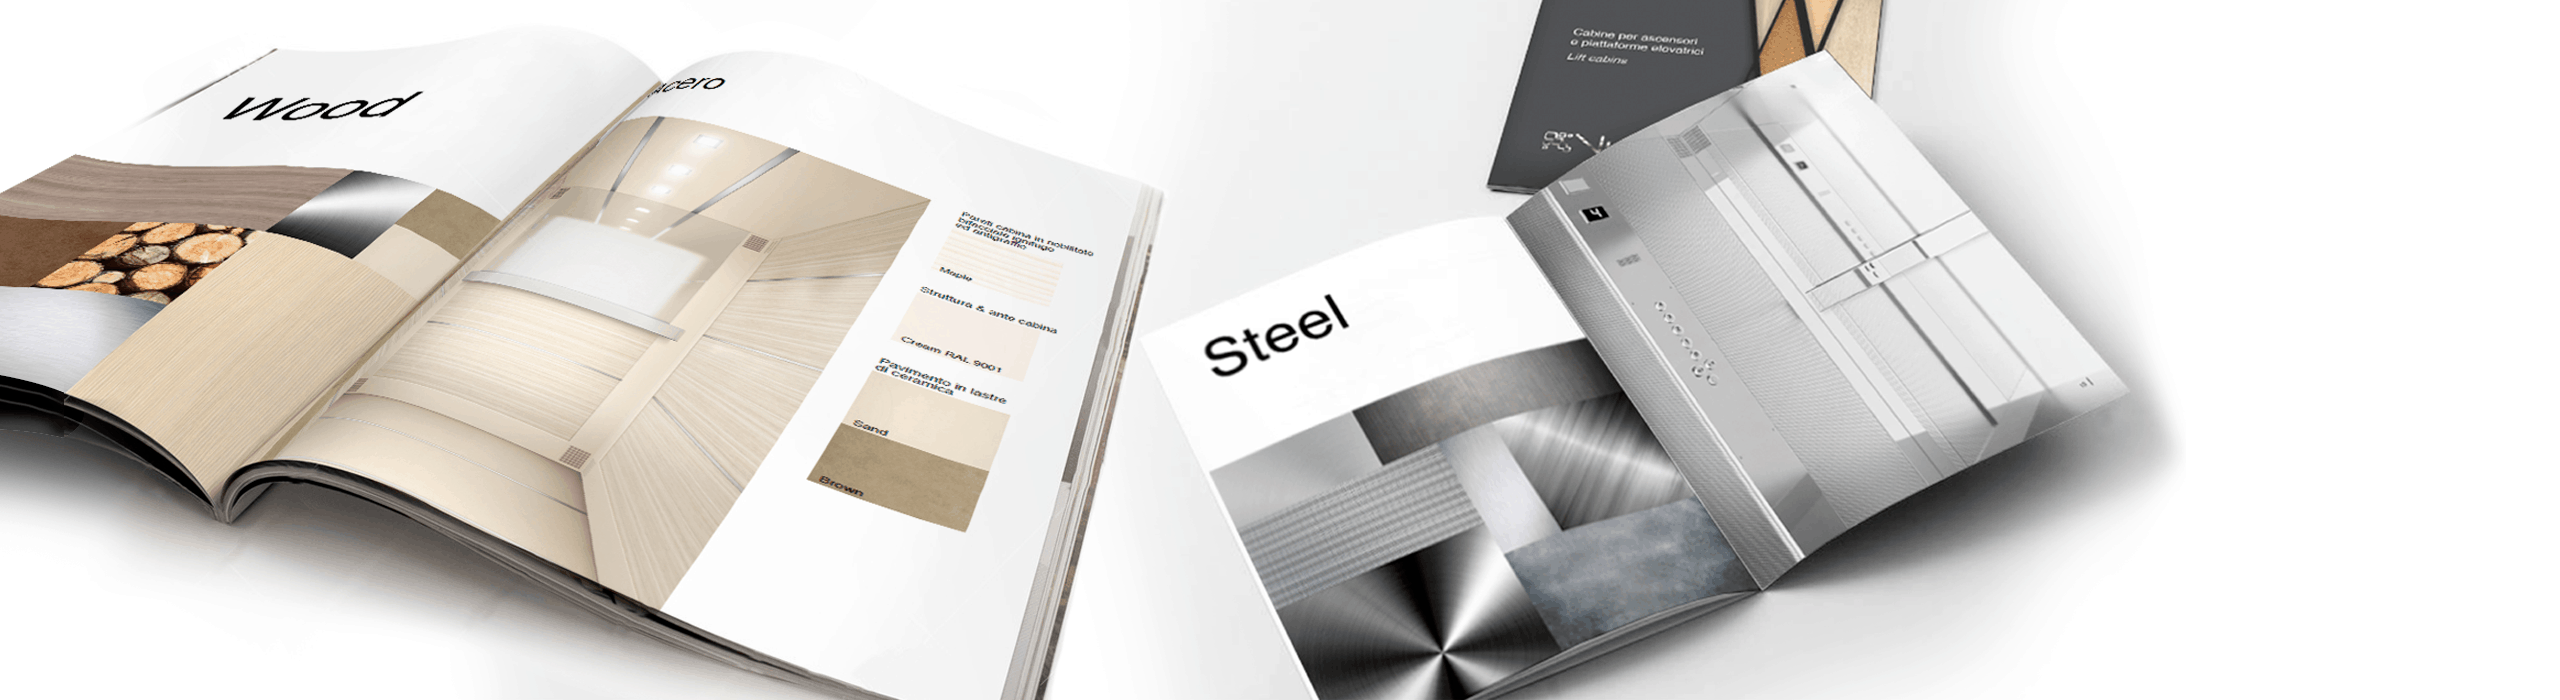 ondesign-brand-design-projectslider08